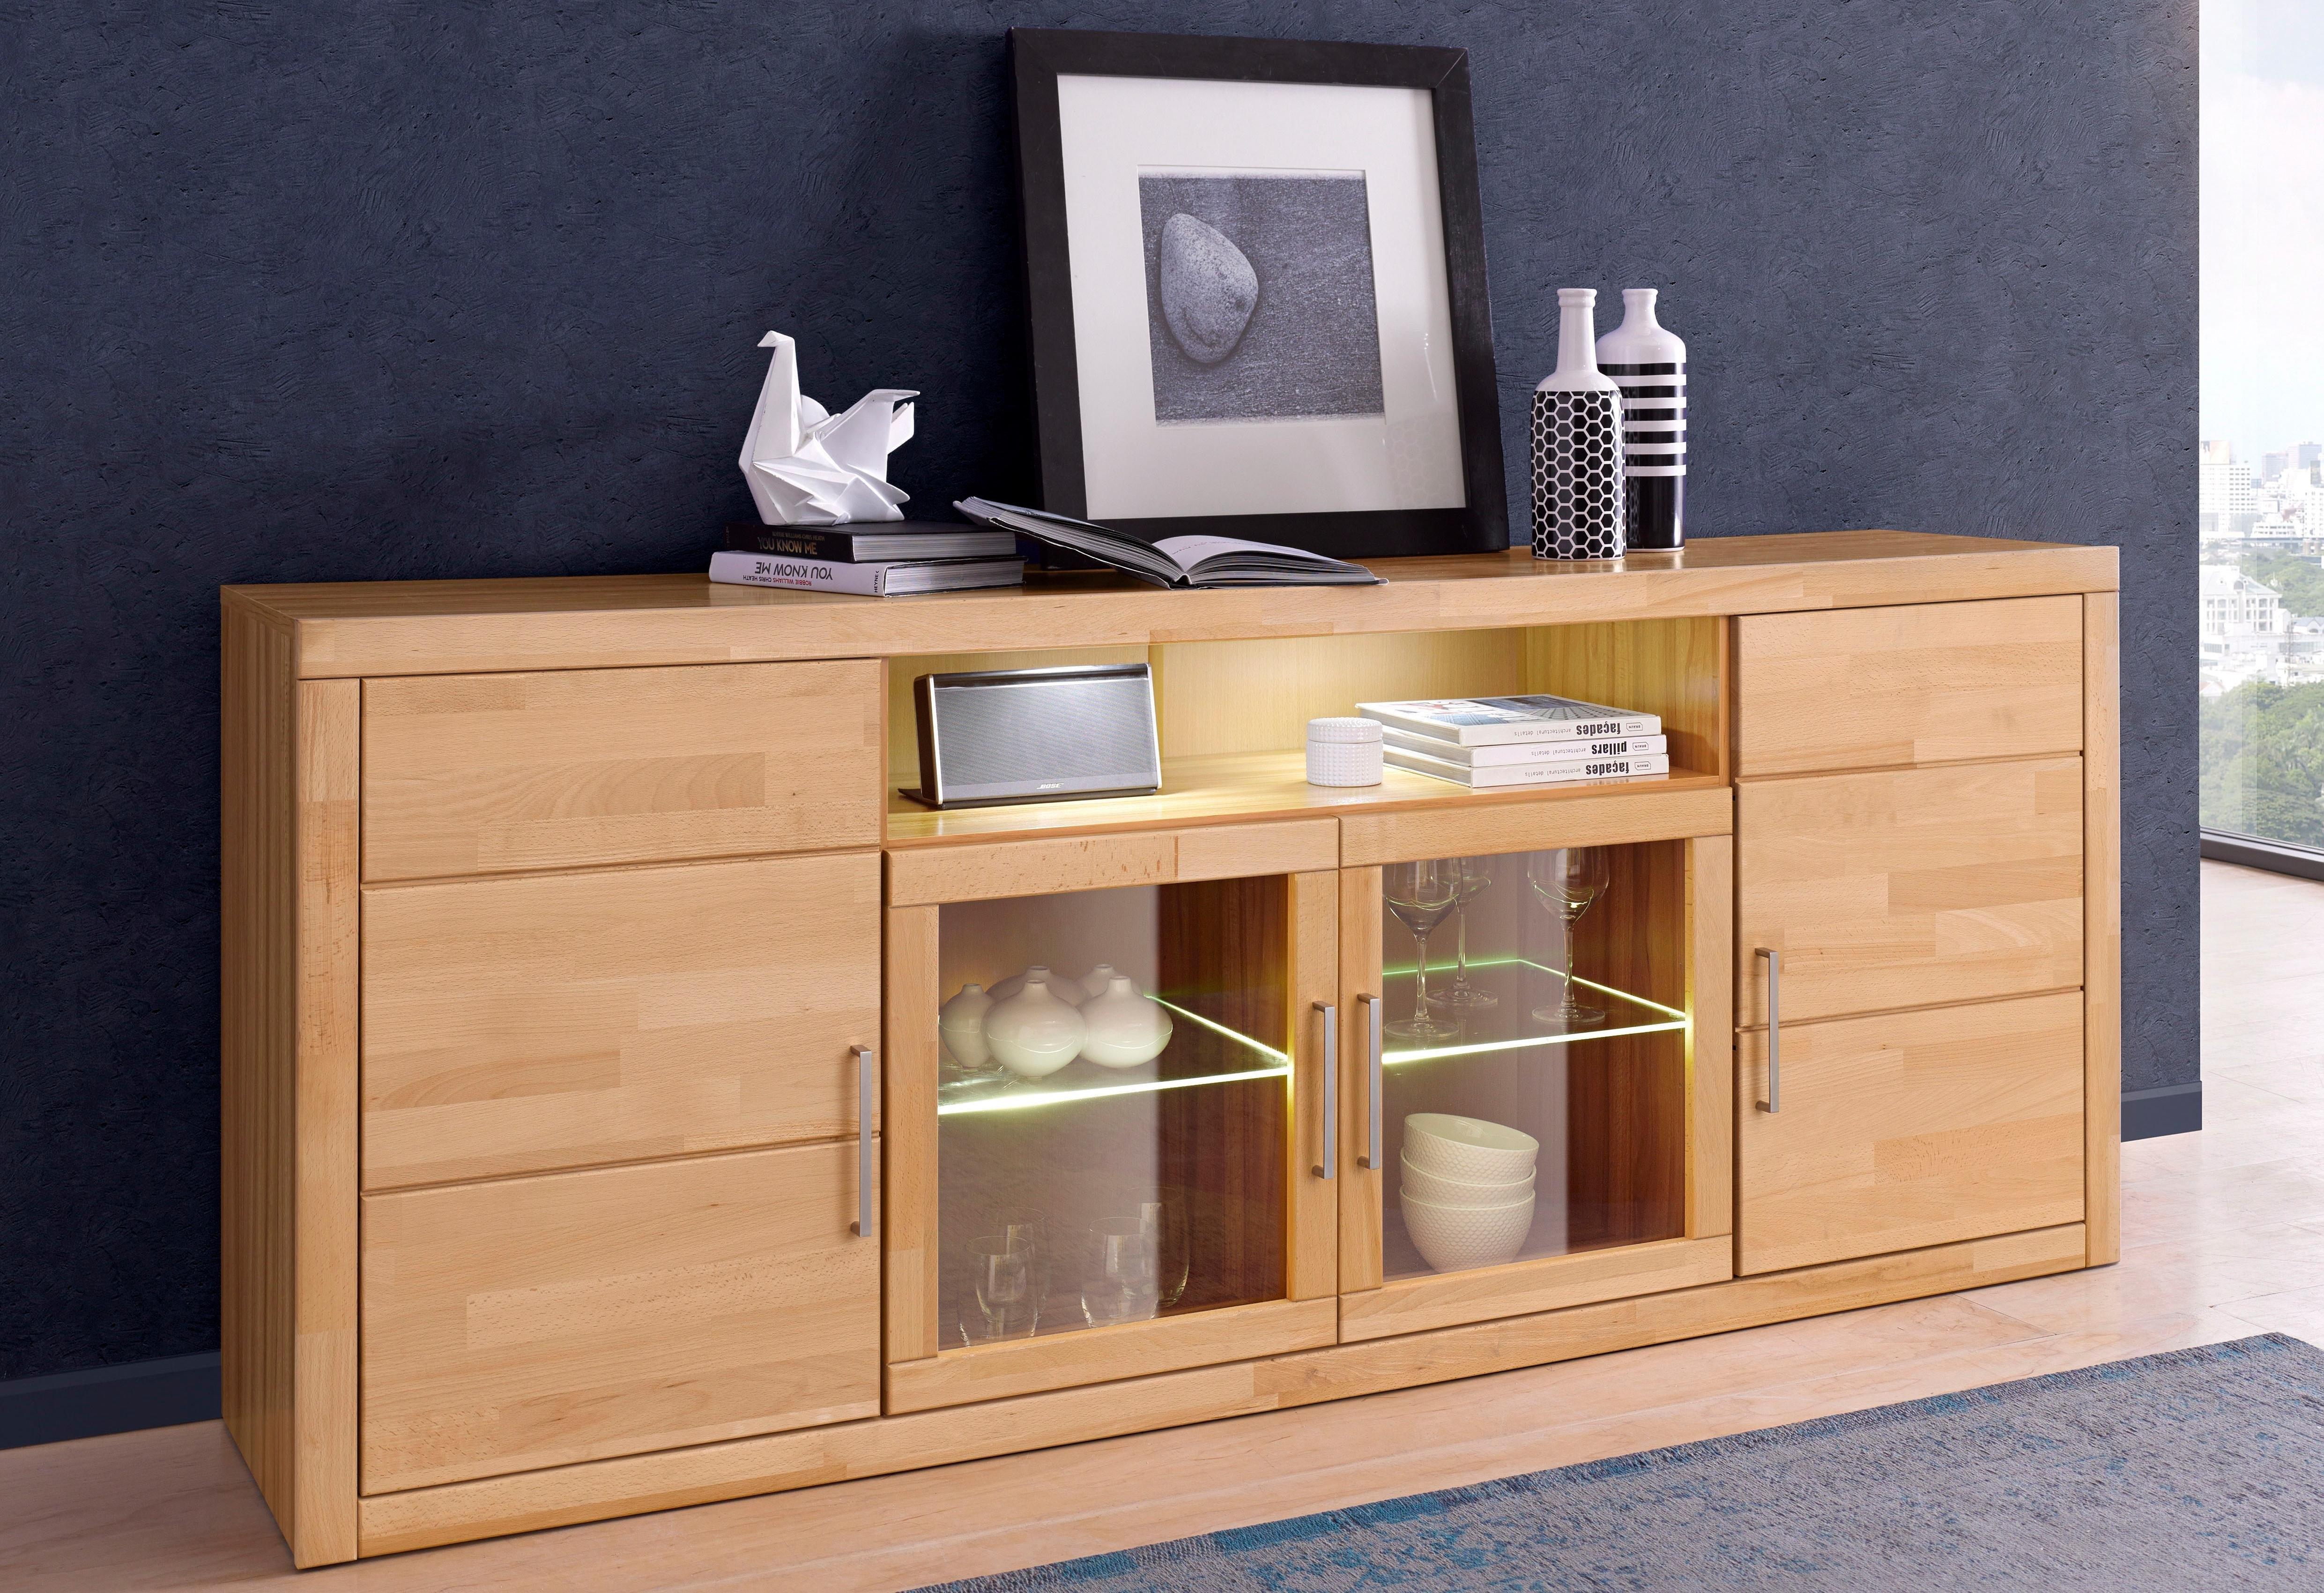 Places Of Style roomed sideboard, breedte 200 cm voordelig en veilig online kopen